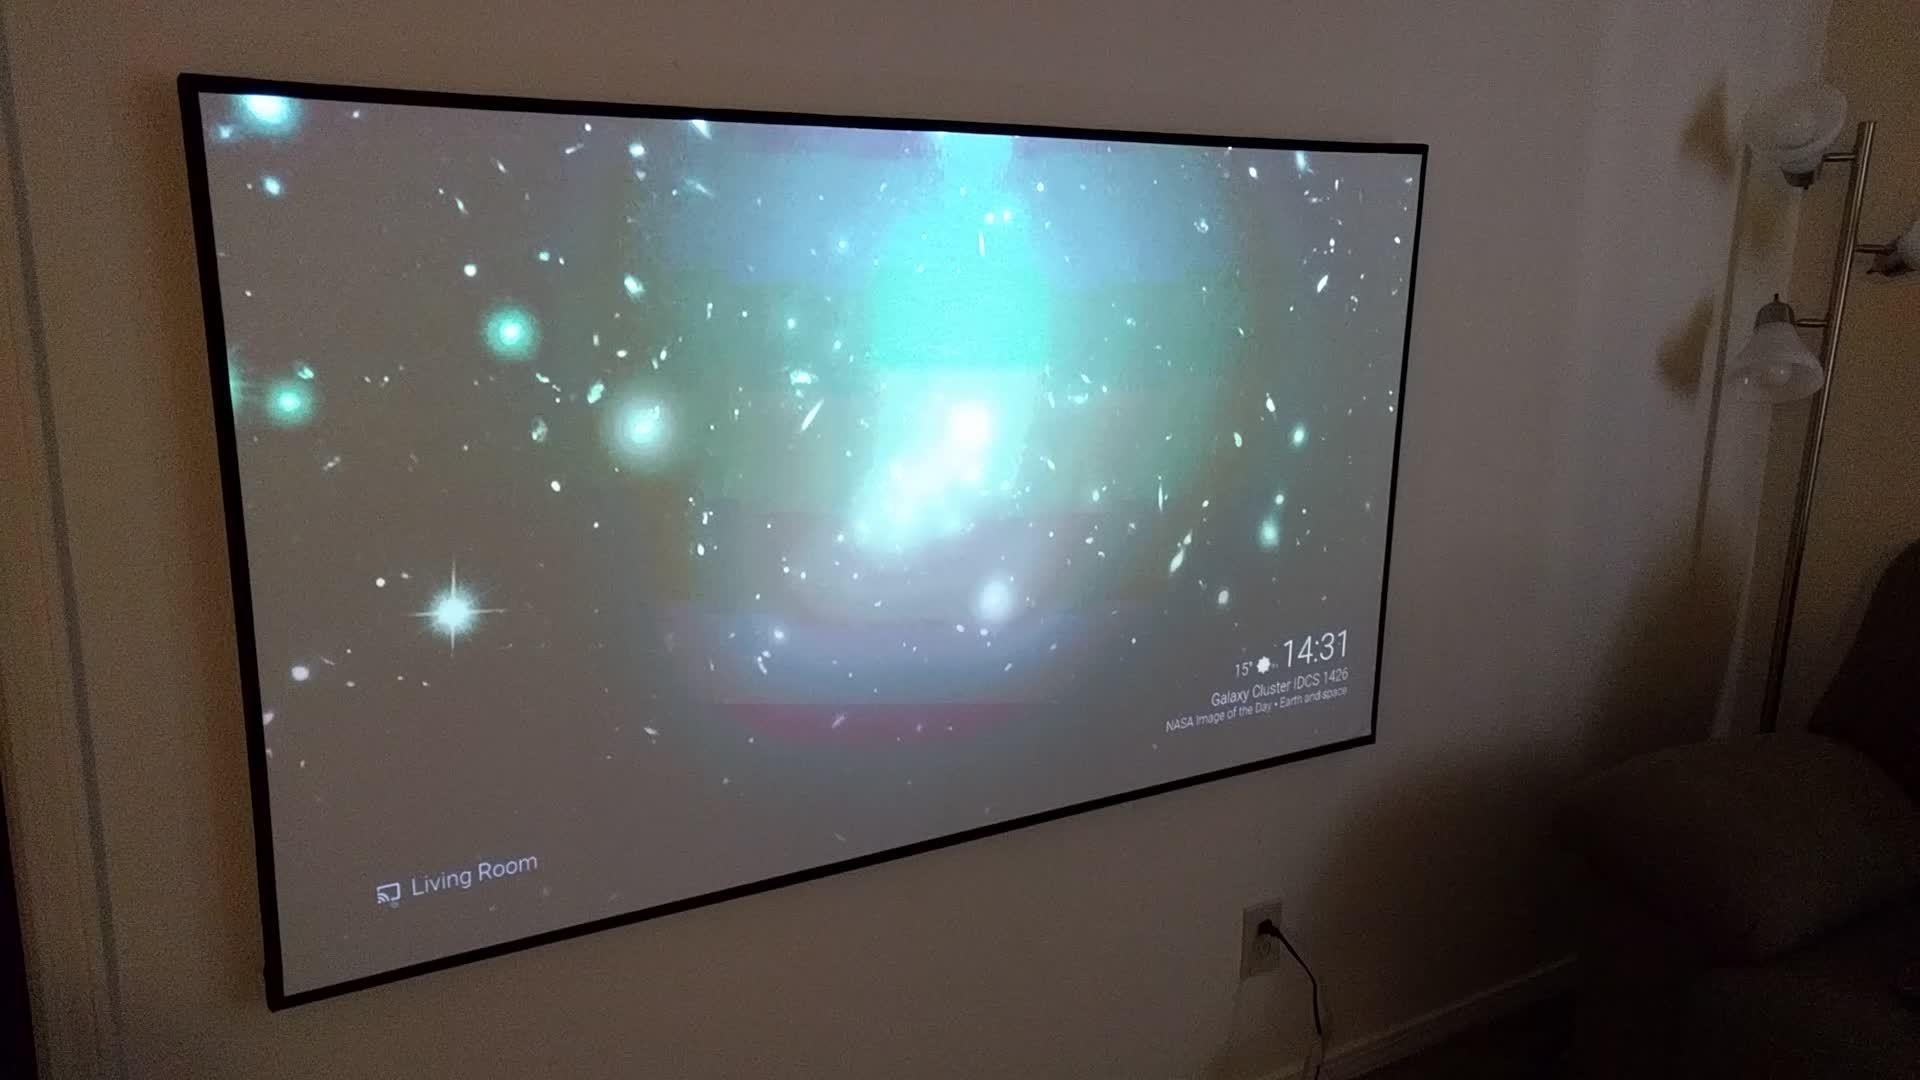 projectors, techsupport, failing projector? GIFs